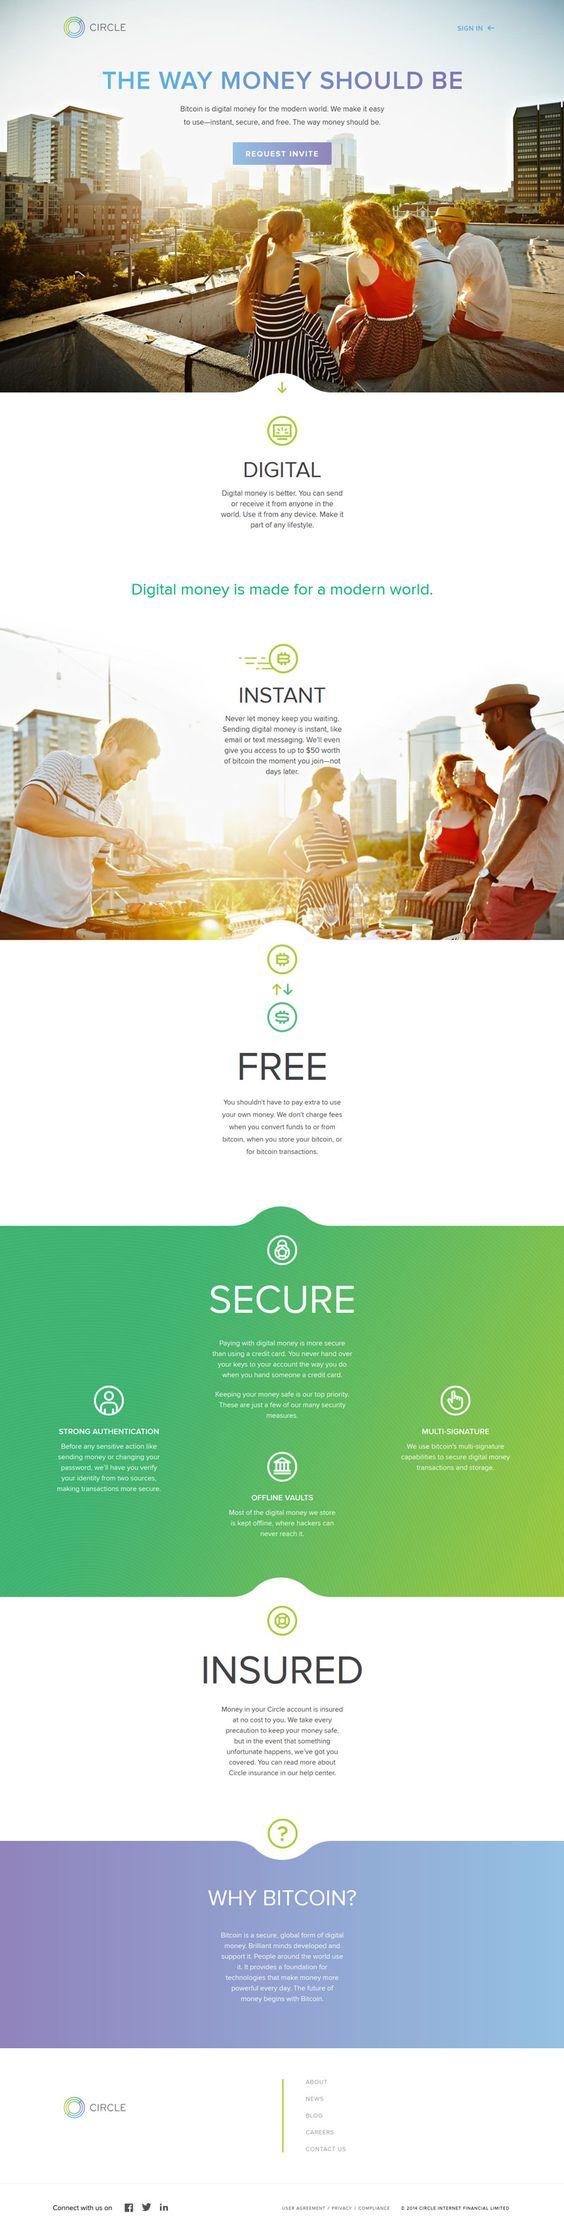 Cool Web Design, Circle. #webdesign #webdevelopment…